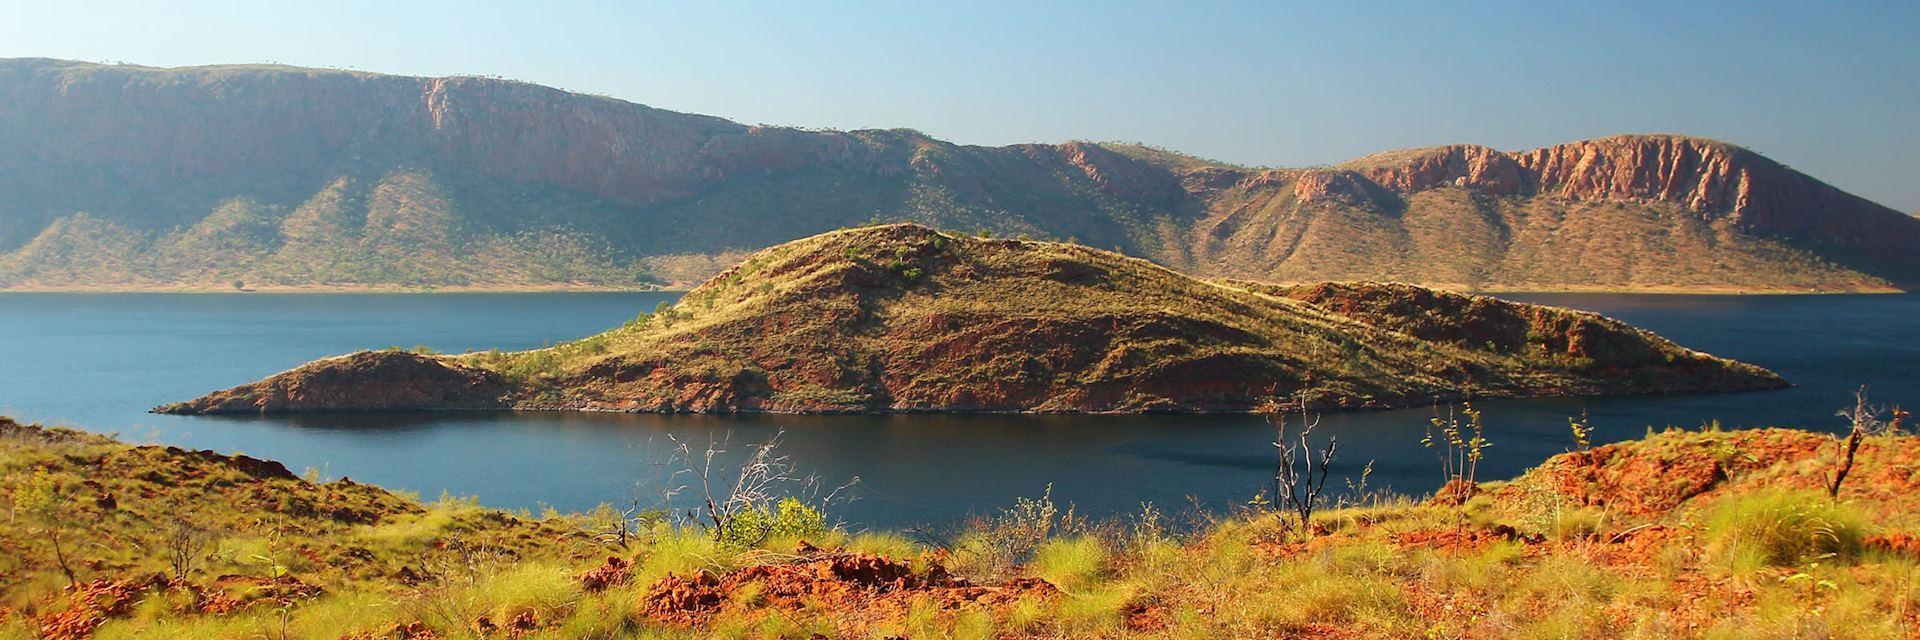 Lake Argyle, Kununurra